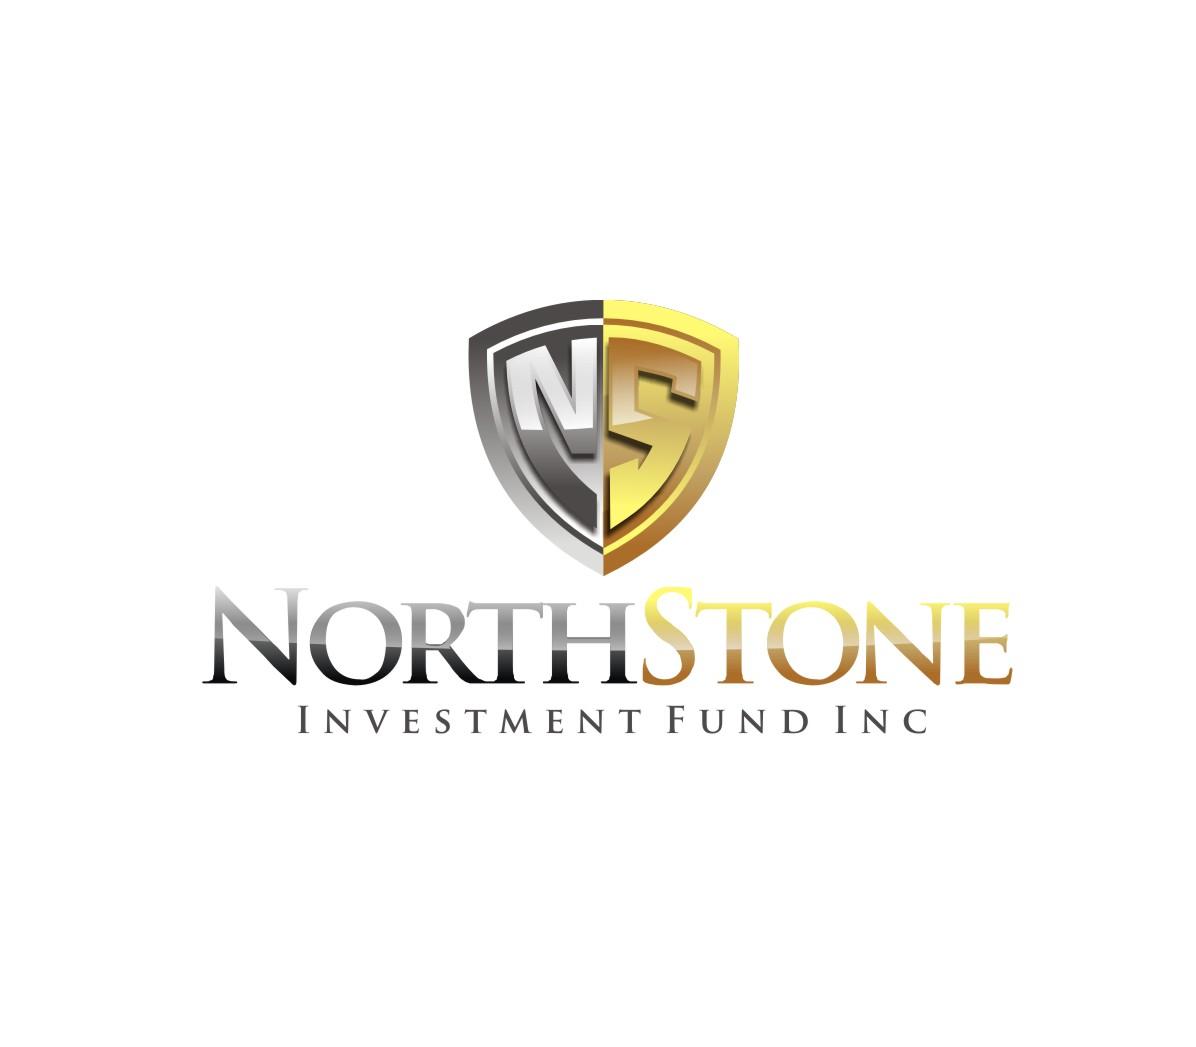 Logo Design by Reivan Ferdinan - Entry No. 39 in the Logo Design Contest Unique Logo Design Wanted for NorthStone Investment Fund Inc.